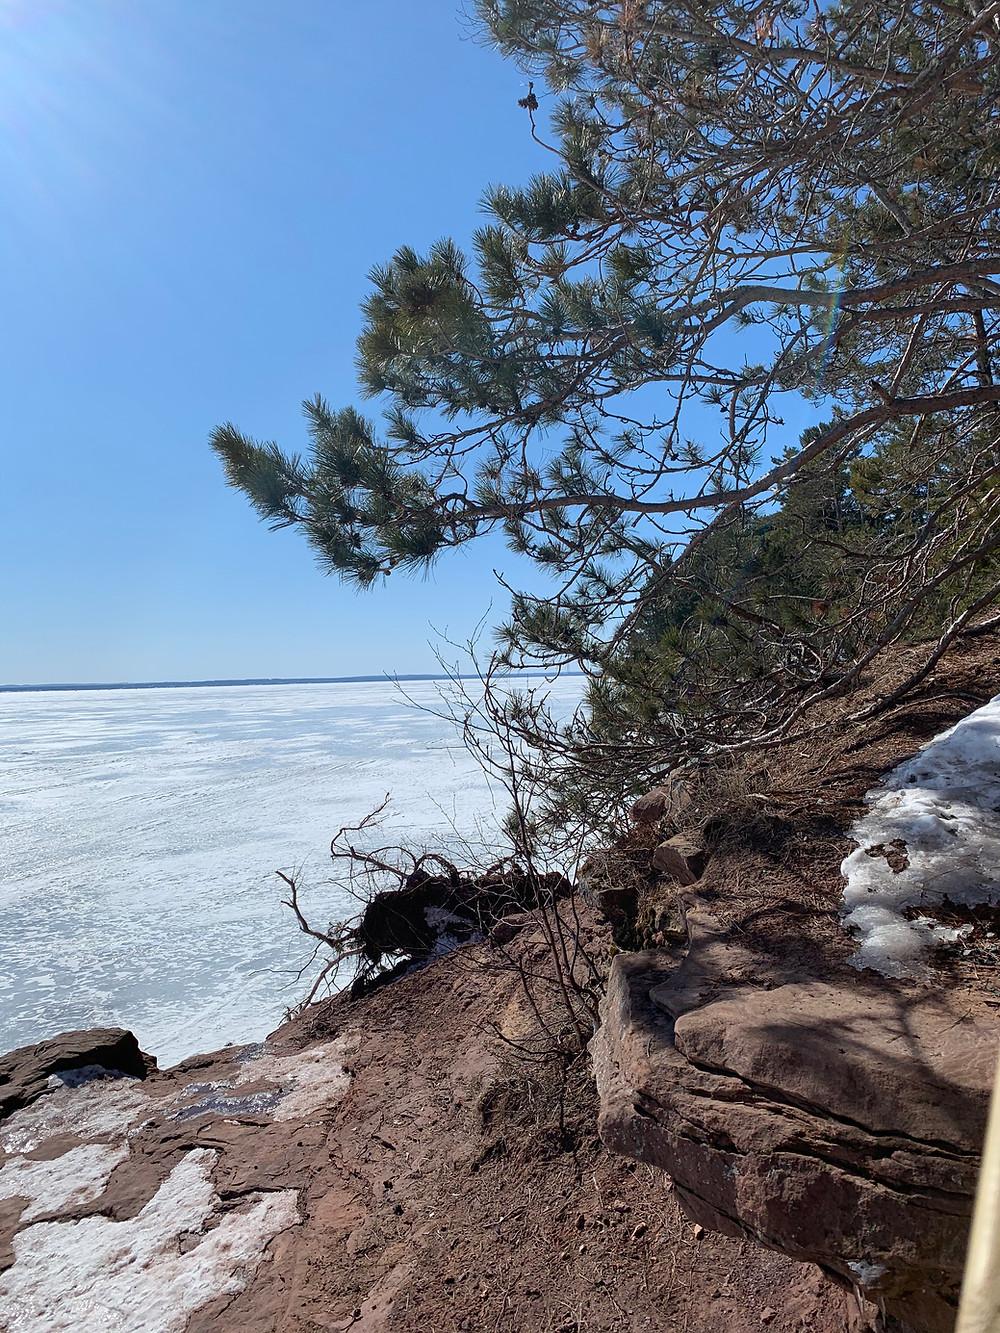 Winter hiking Bayfield, Wi